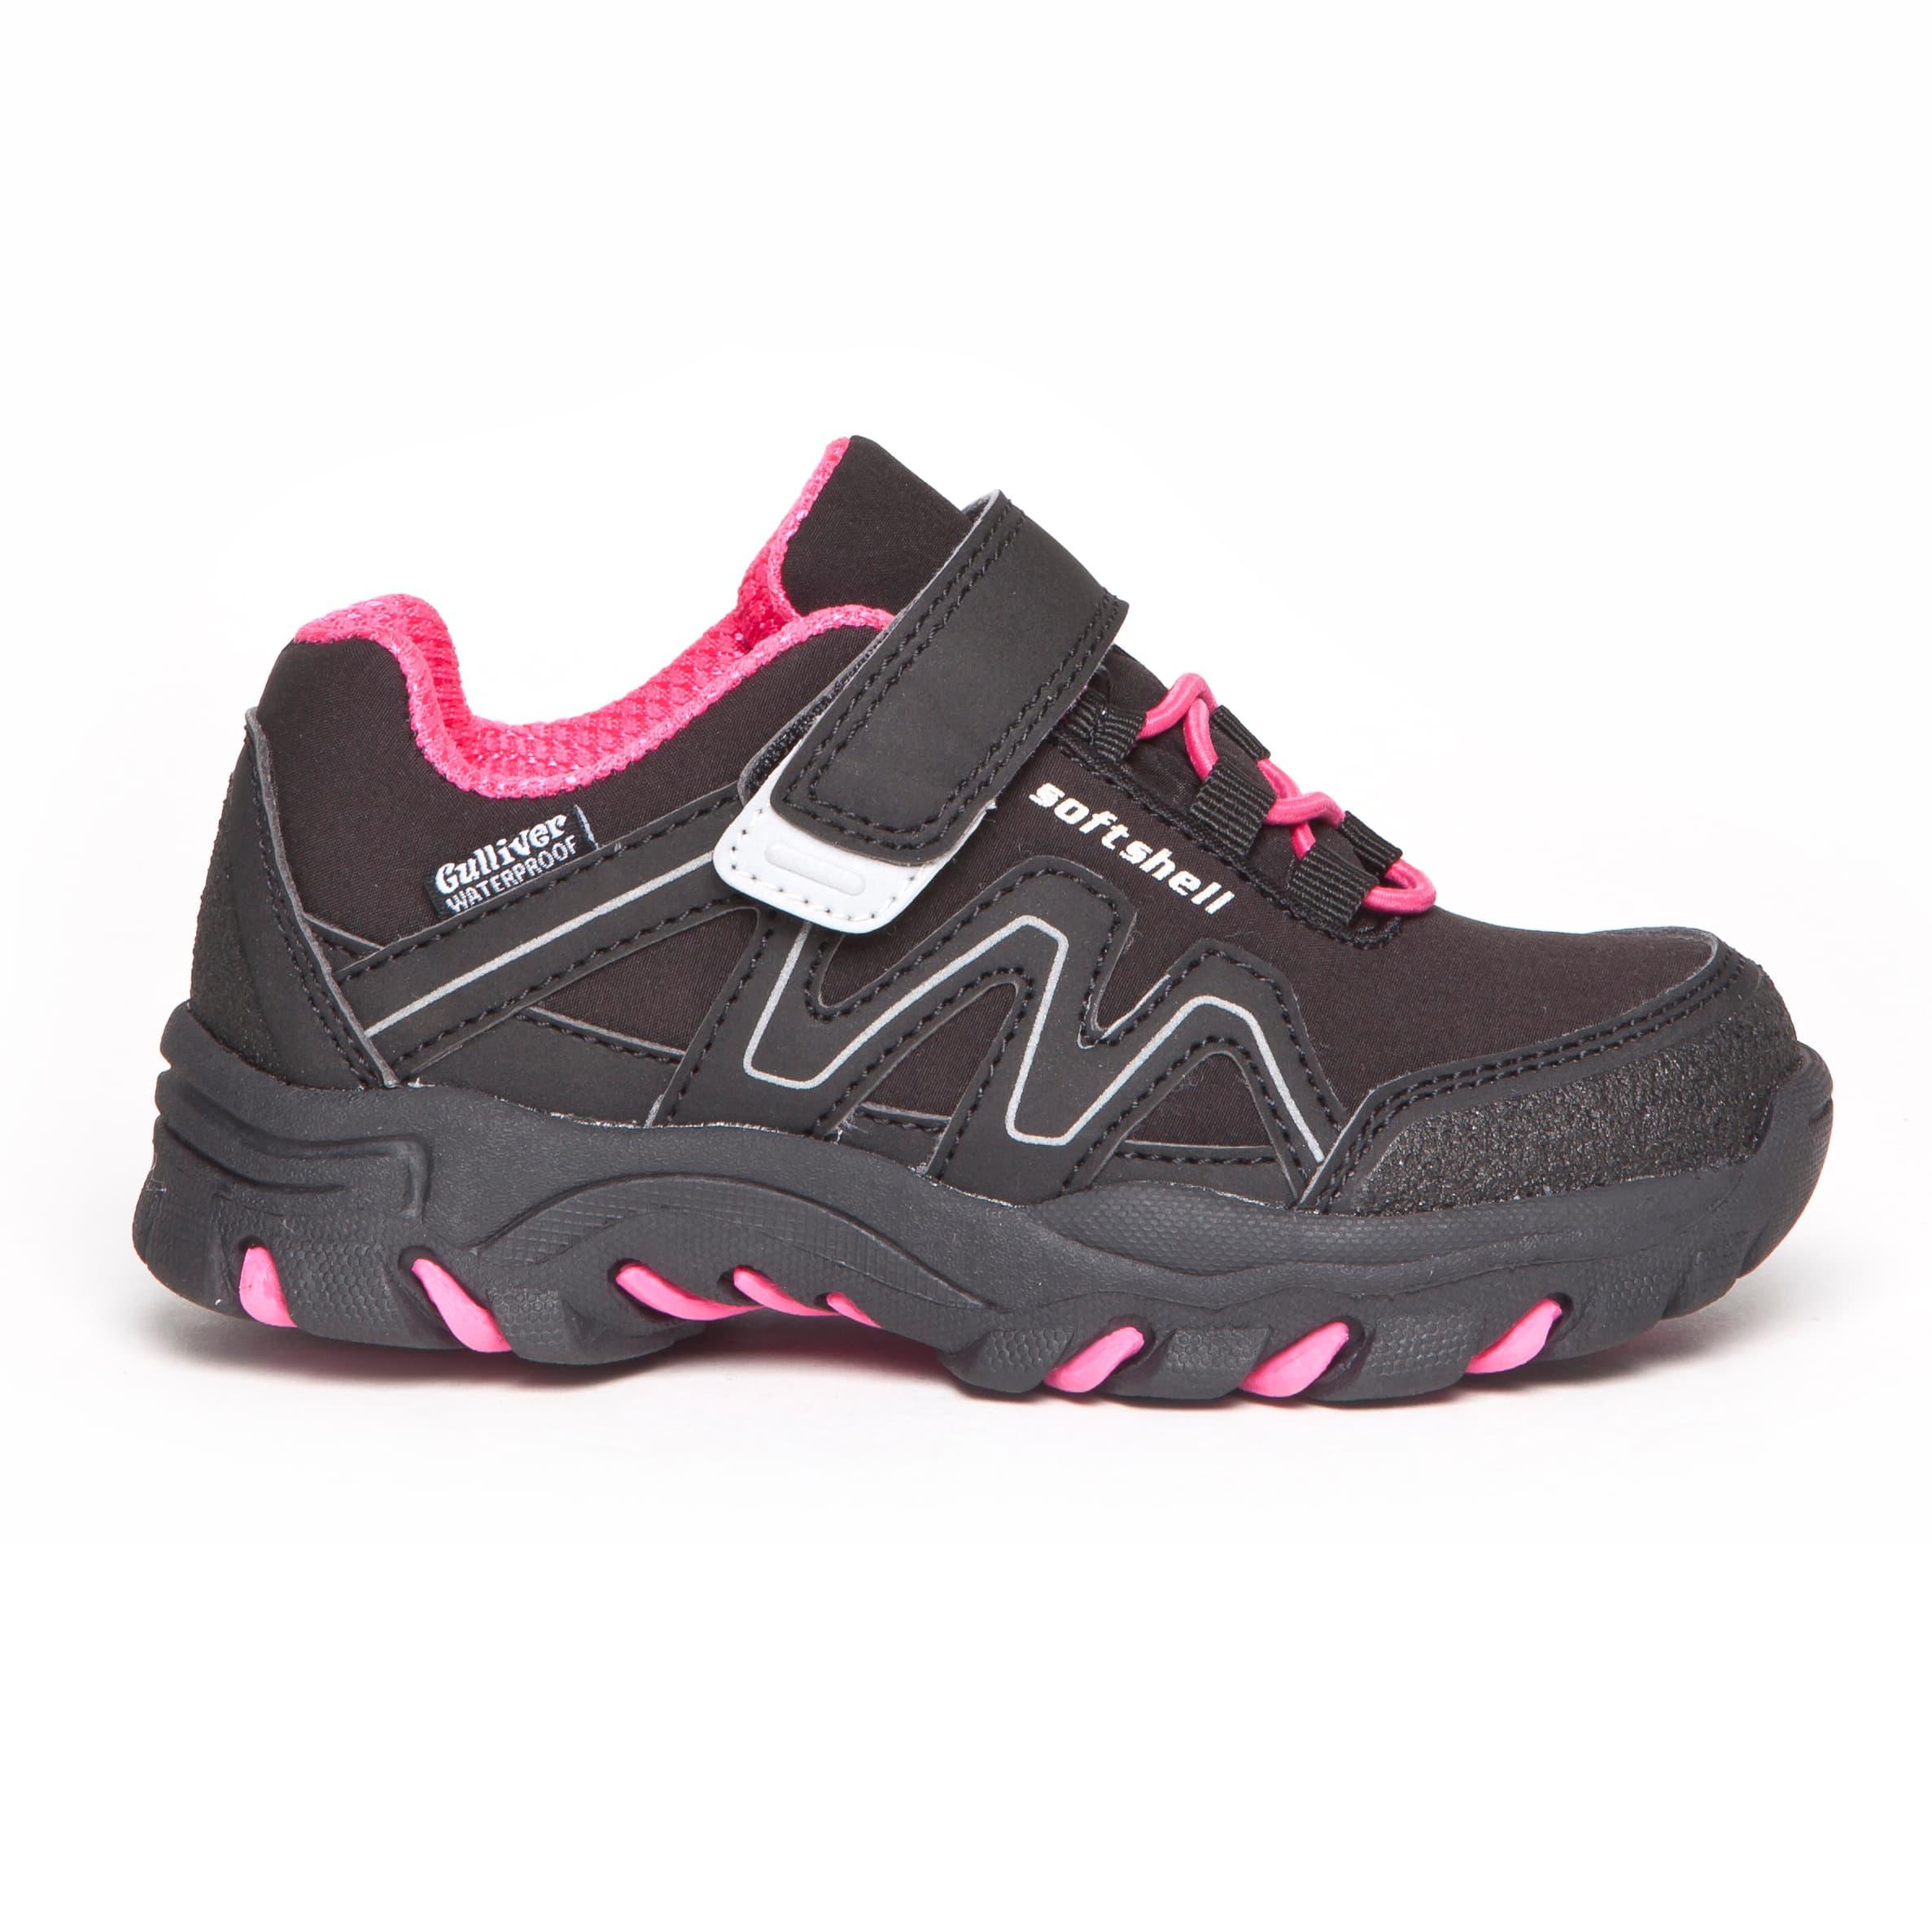 6de191dbdfc Köp Gulliver Waterproof Shoes hos Outnorth